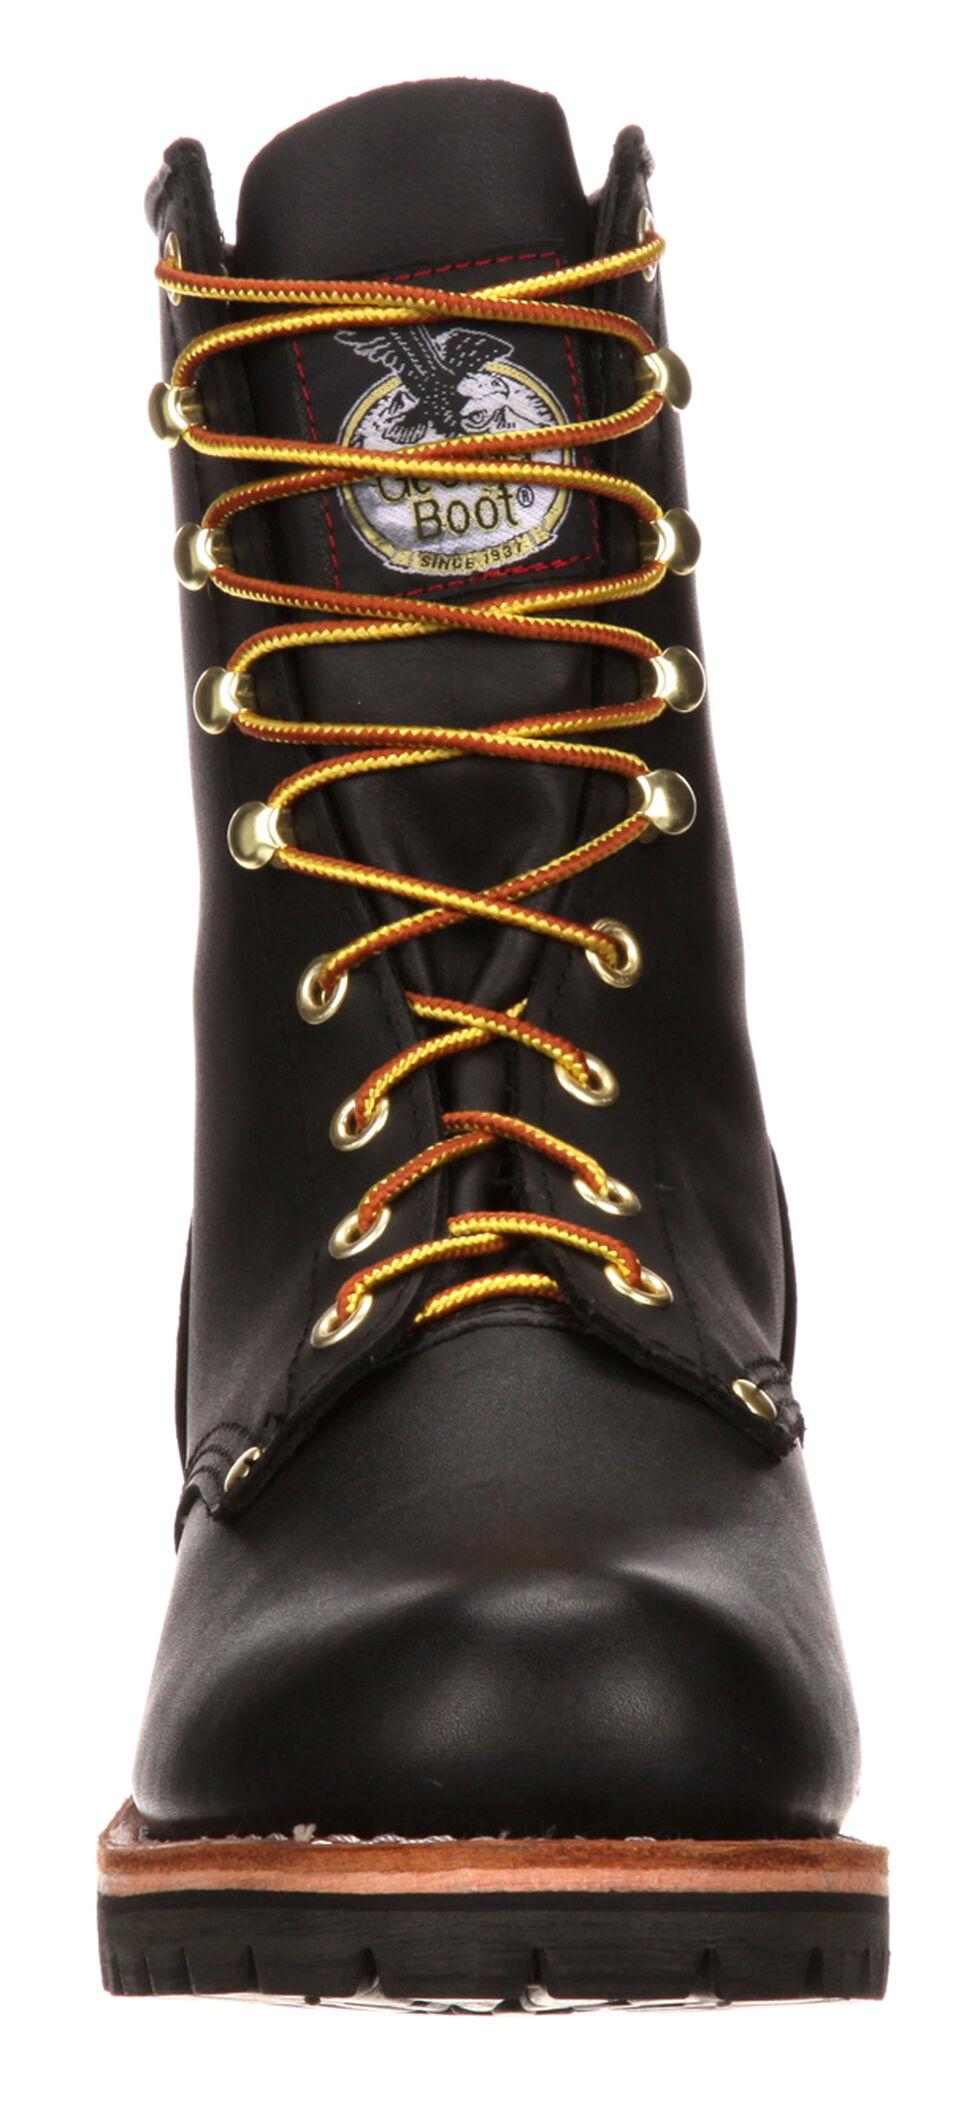 Georgia Logger Work Boots - Round Toe, Black, hi-res